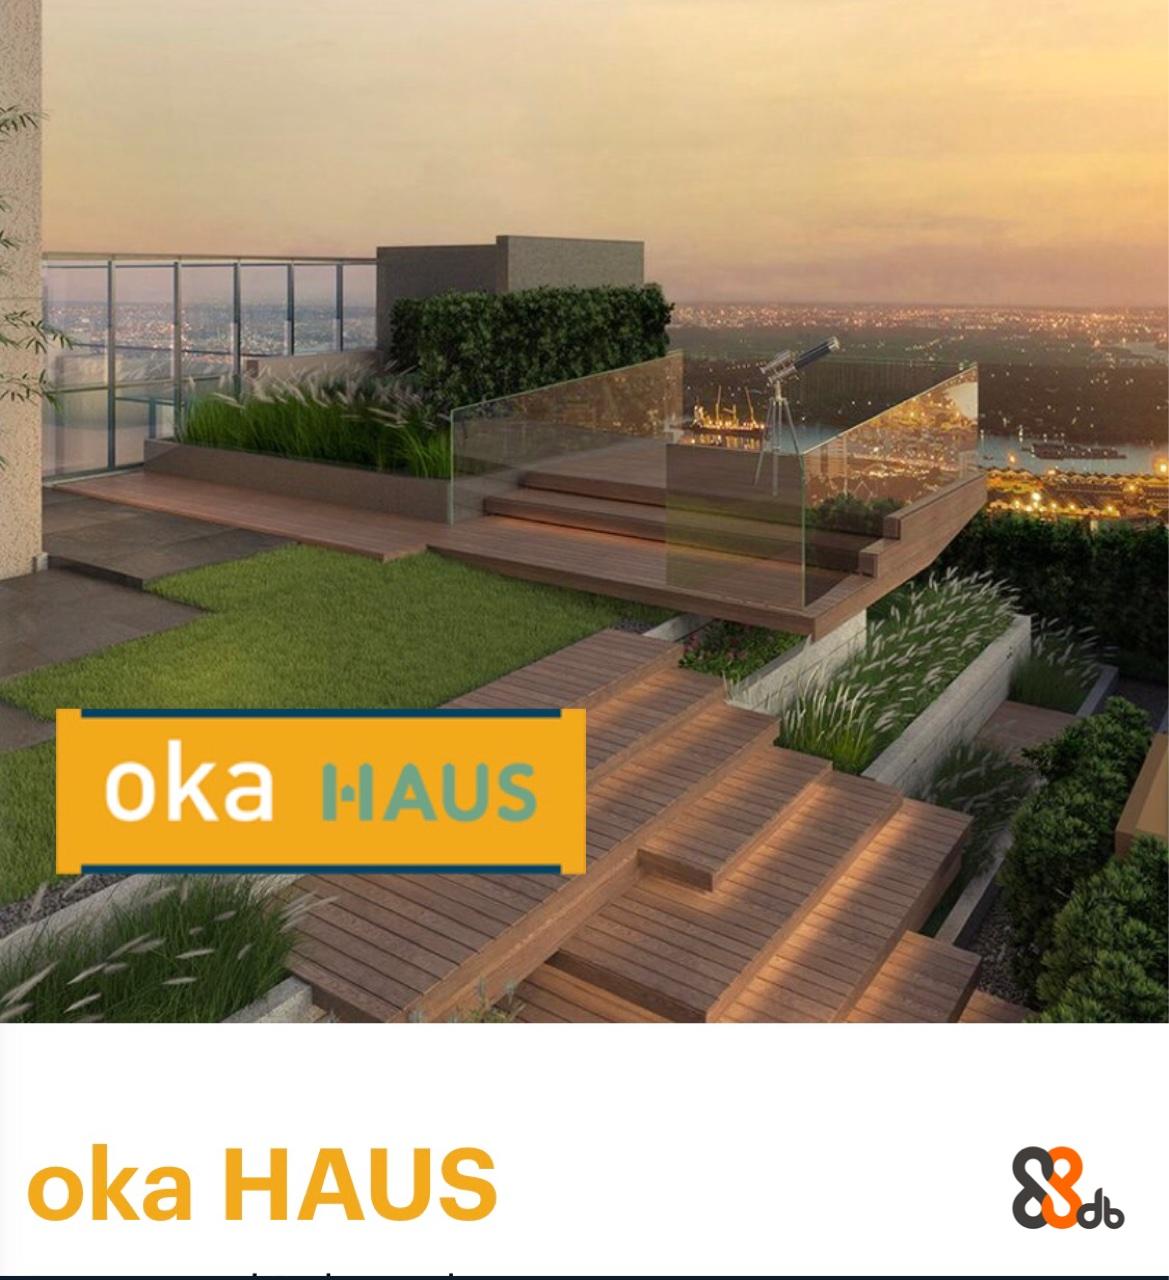 oka HAUS oka HAUS  Property,Roof,Grass,Architecture,Urban design